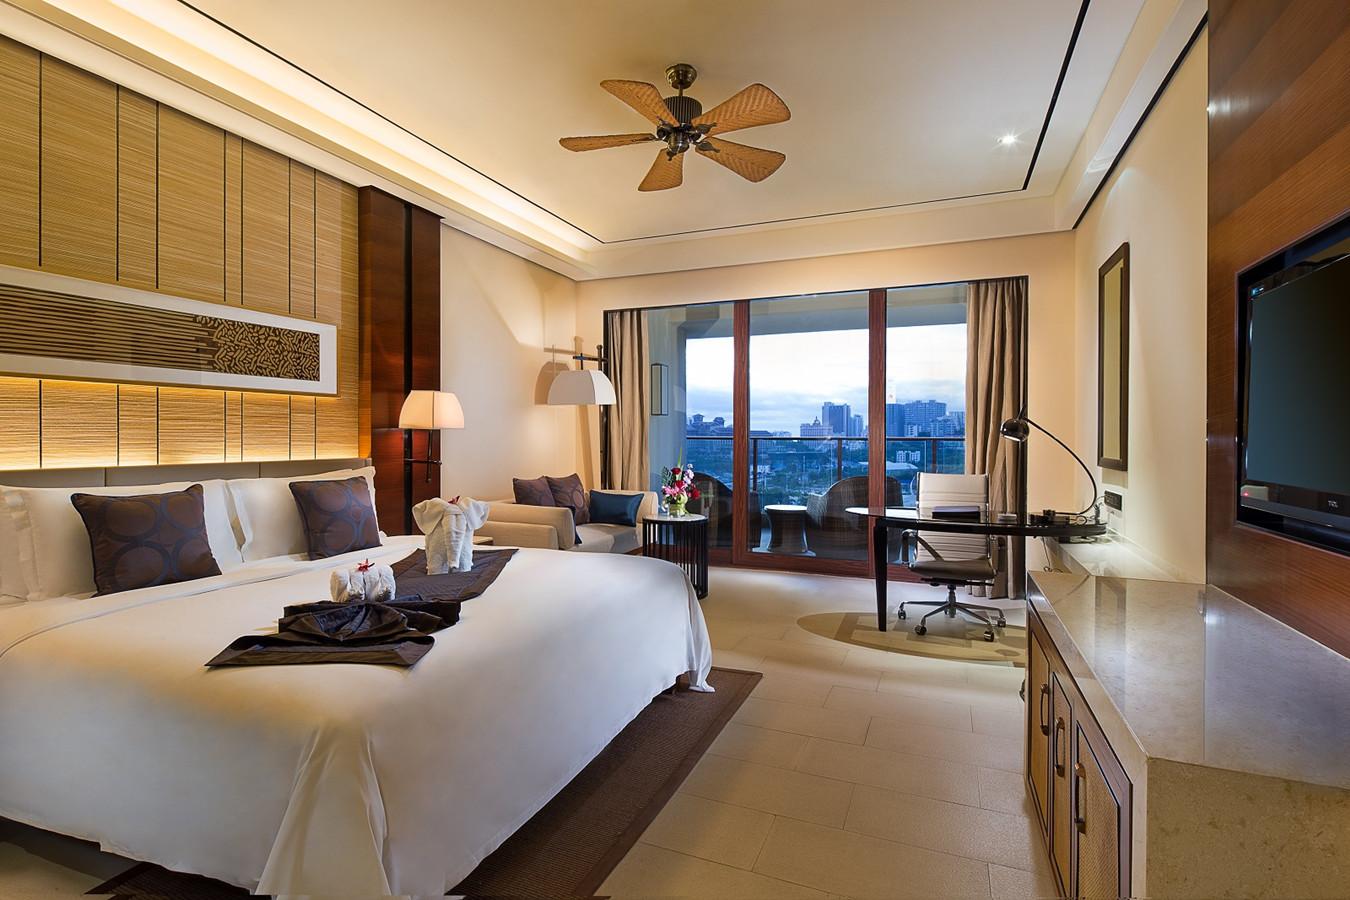 Sanya Crowne Plaza Hotel Hainan11